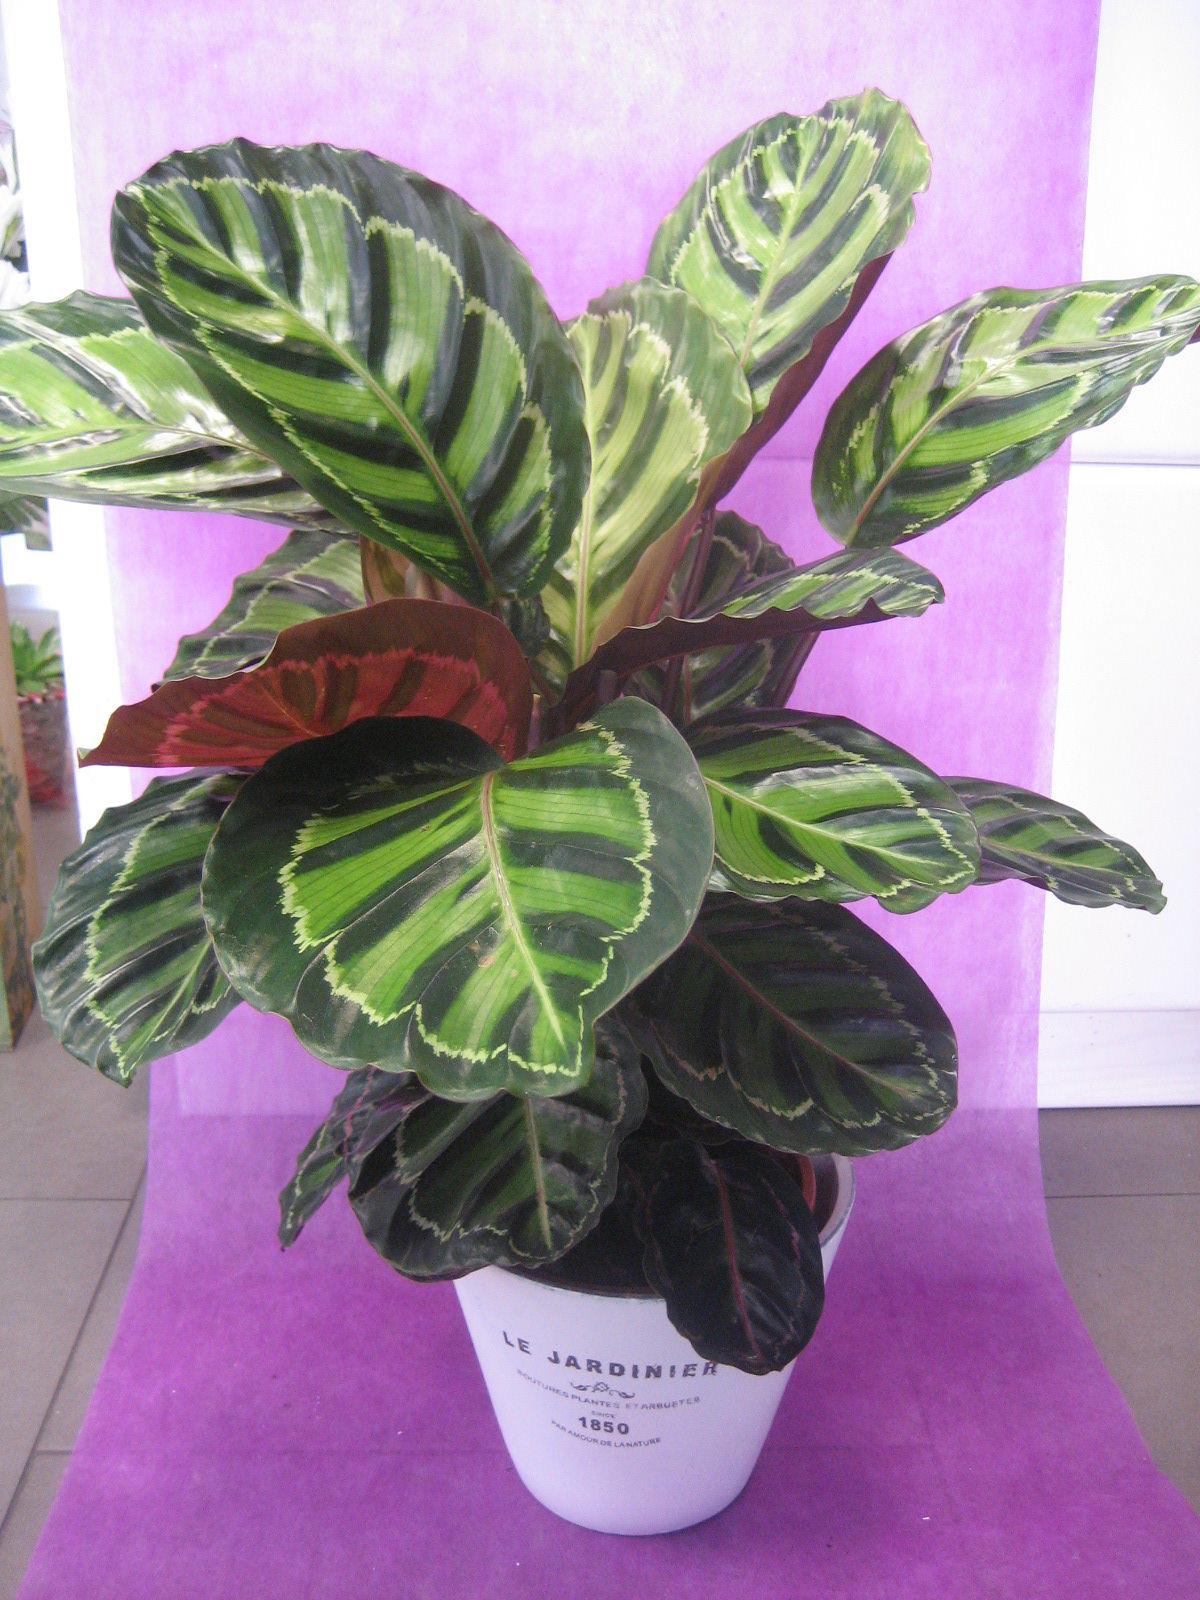 Pin galeria fotos plantas exoticas pictures on pinterest for Plantas de interior exoticas